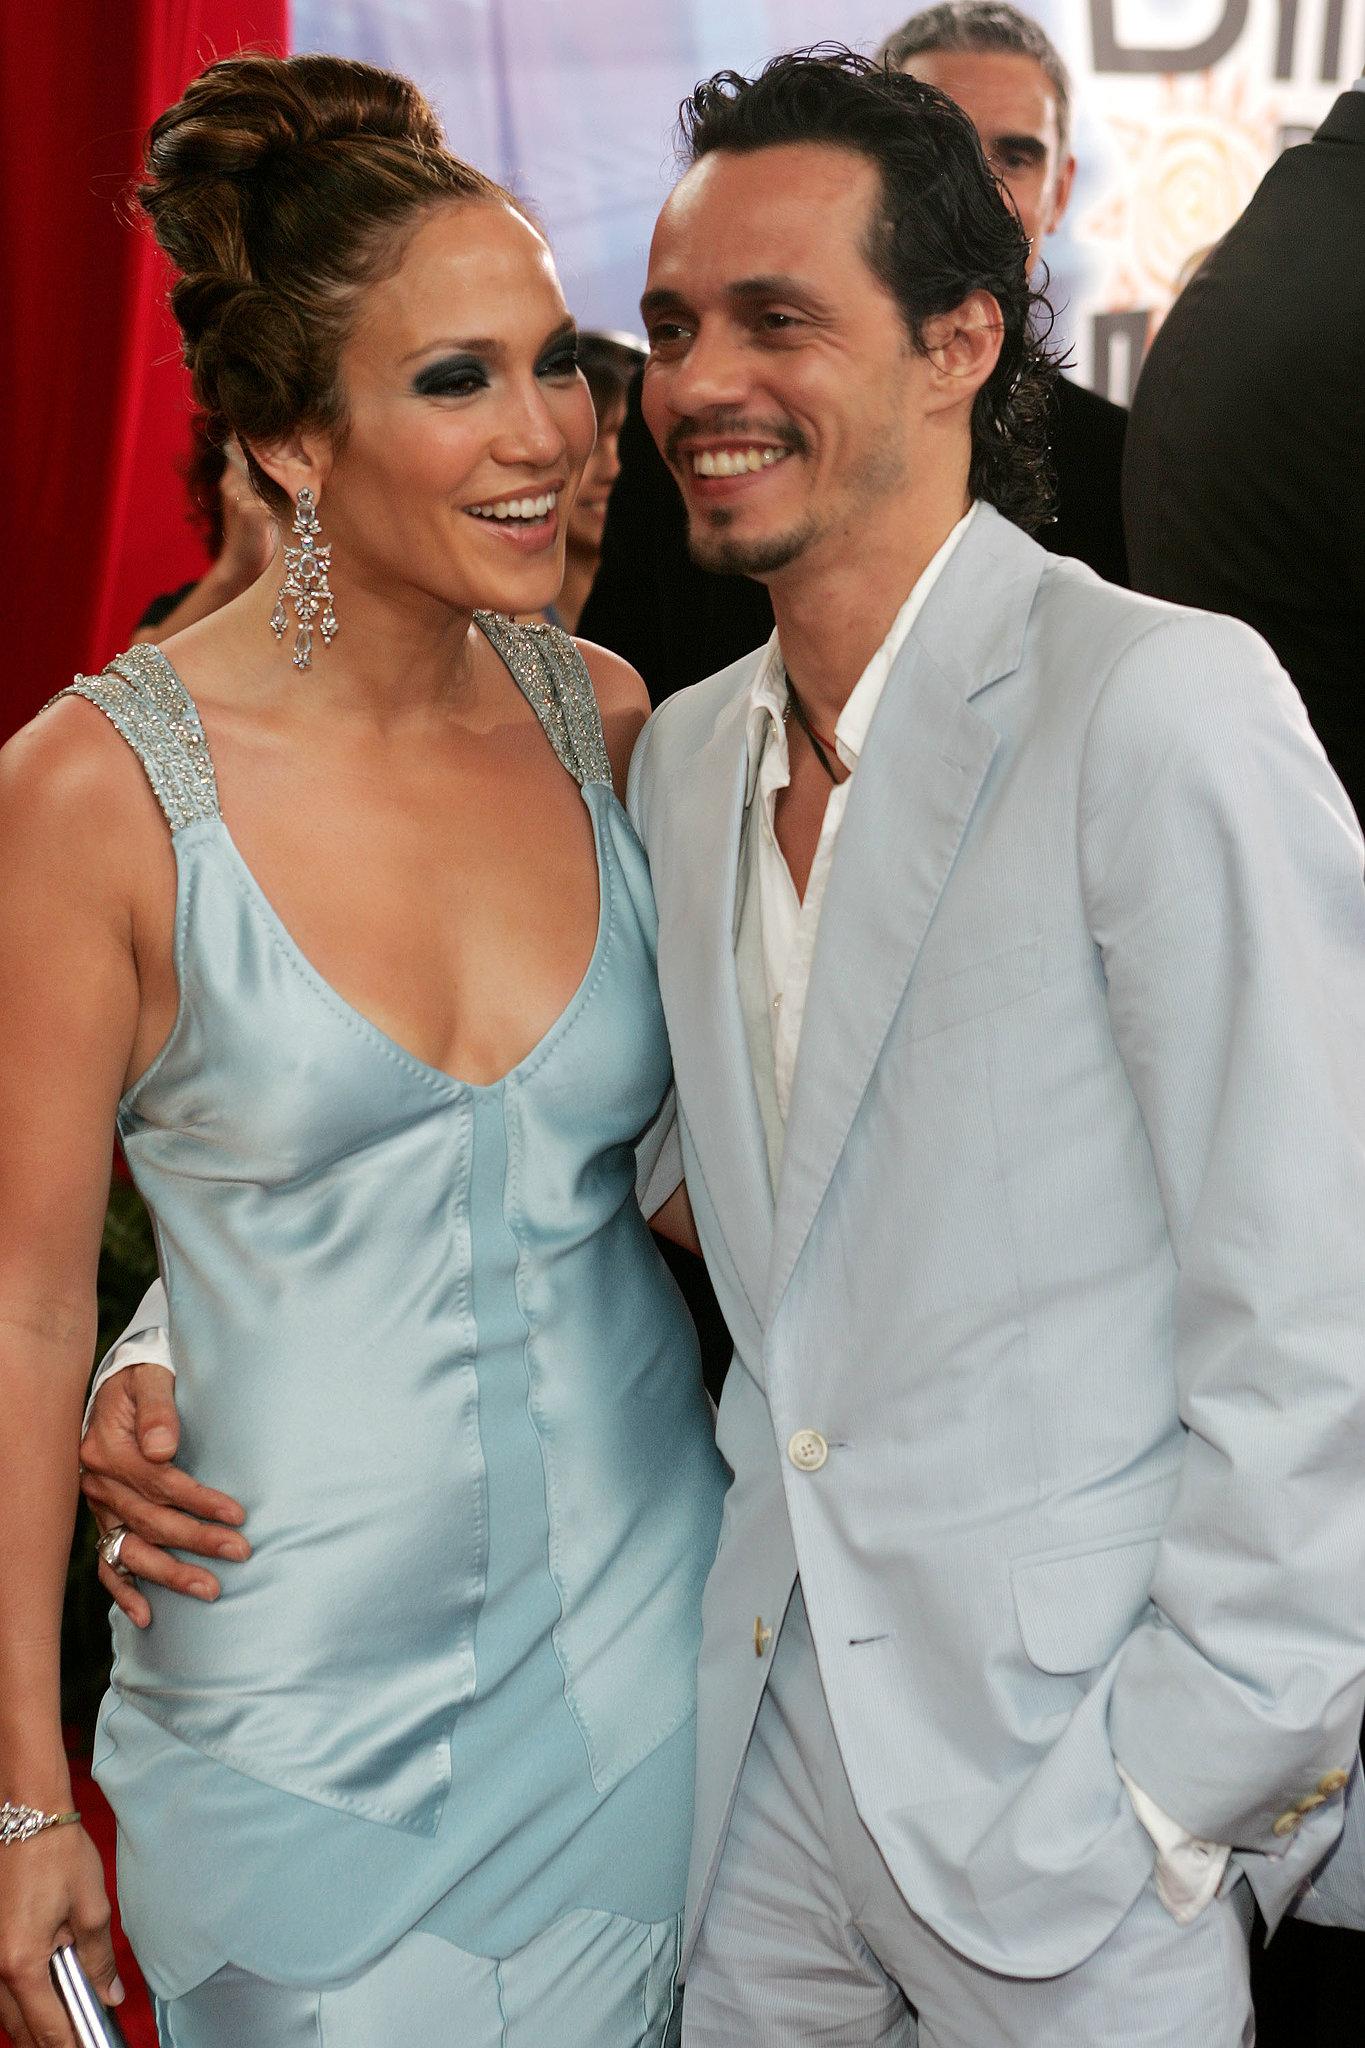 Jennifer Lopez and Marc Anthony walked the carpet together in December 2005.